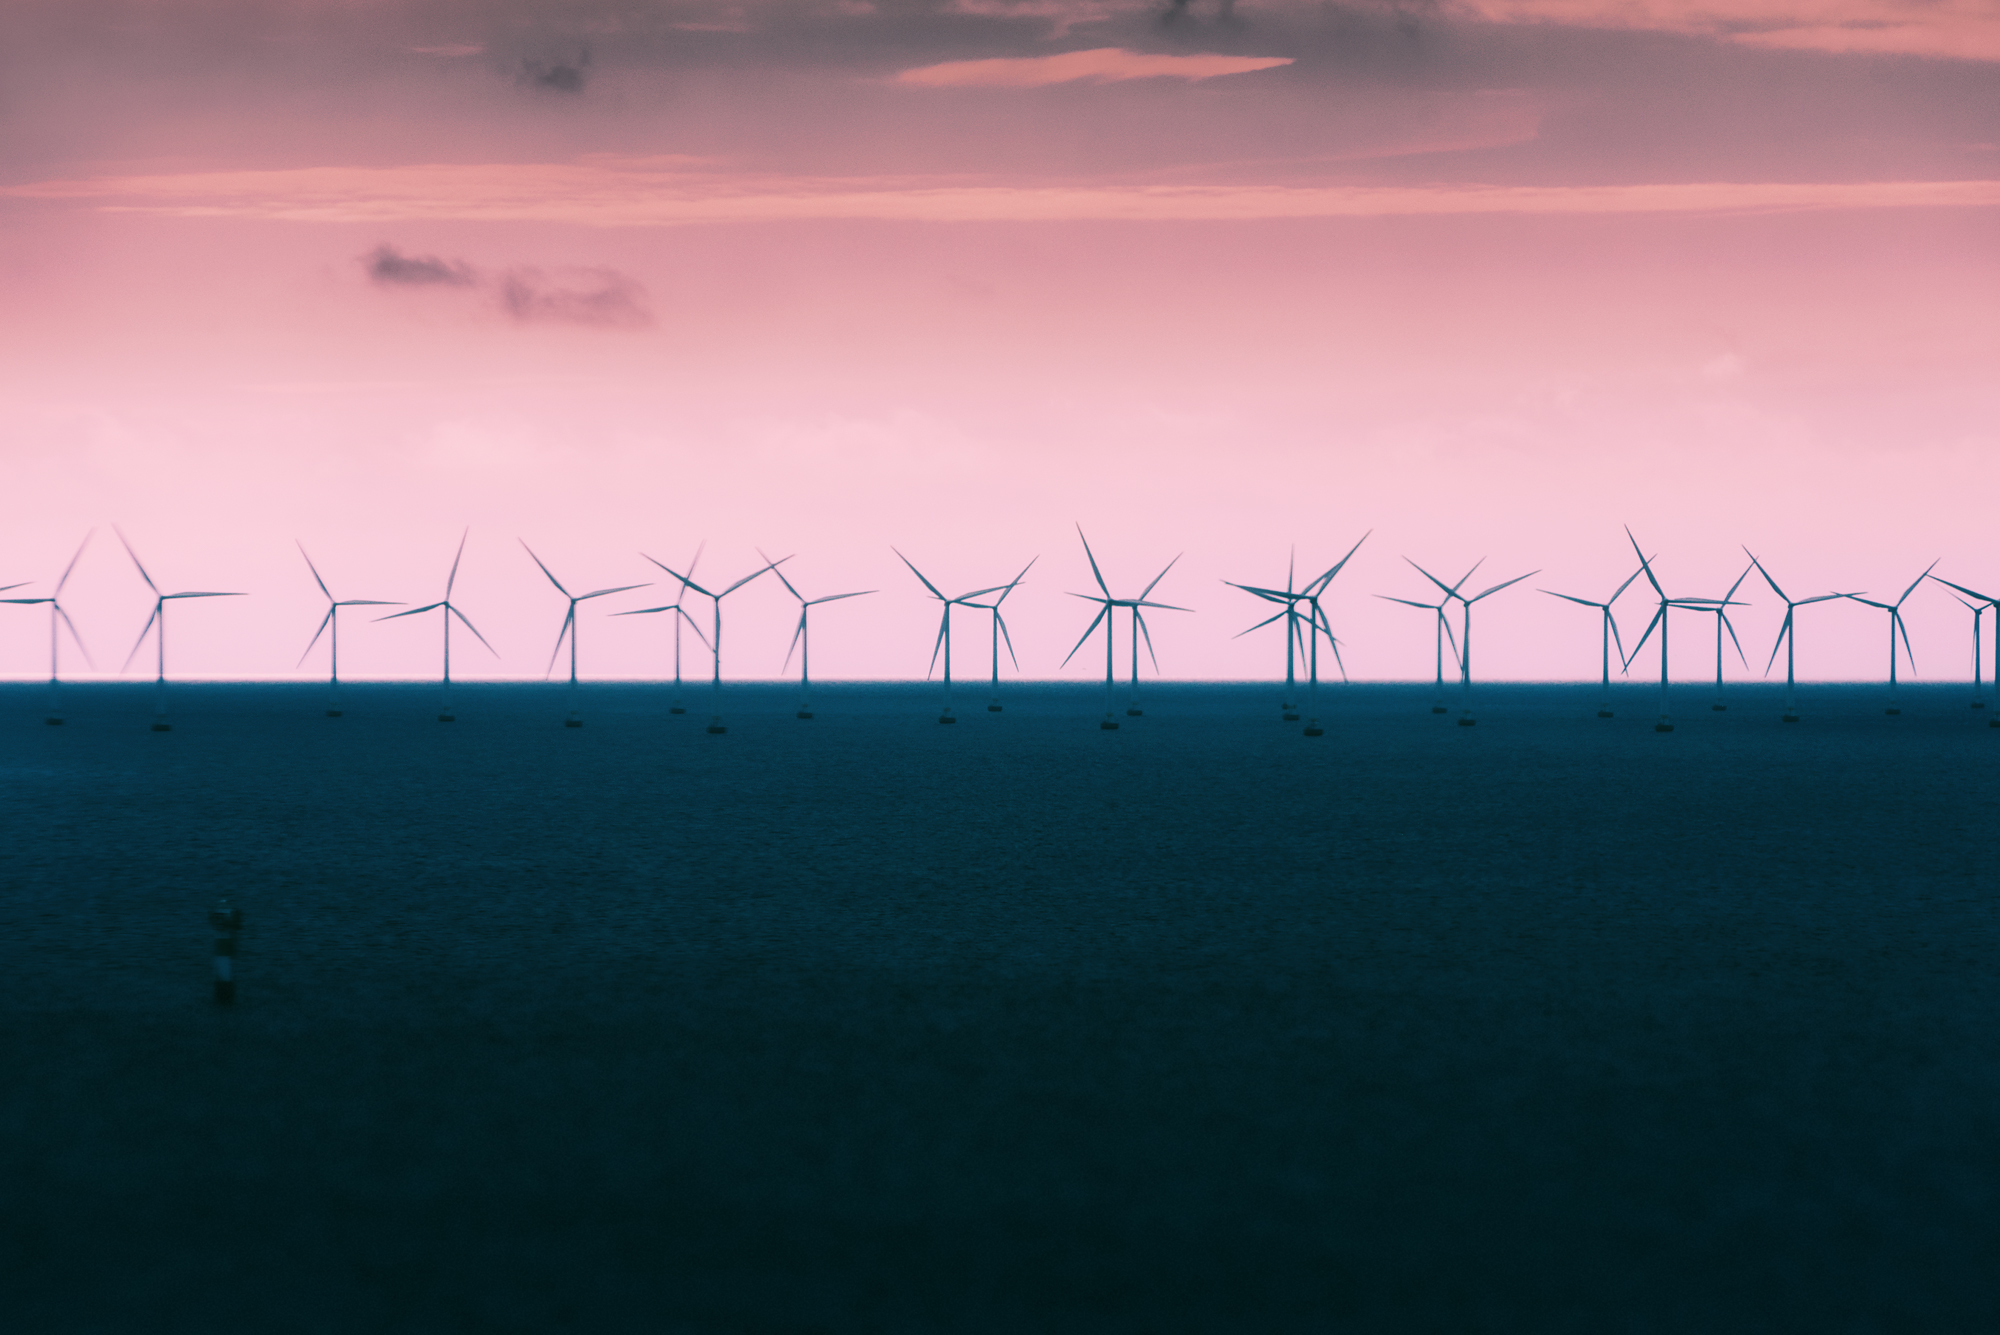 Atmospherics_Windmills_2000px.jpg